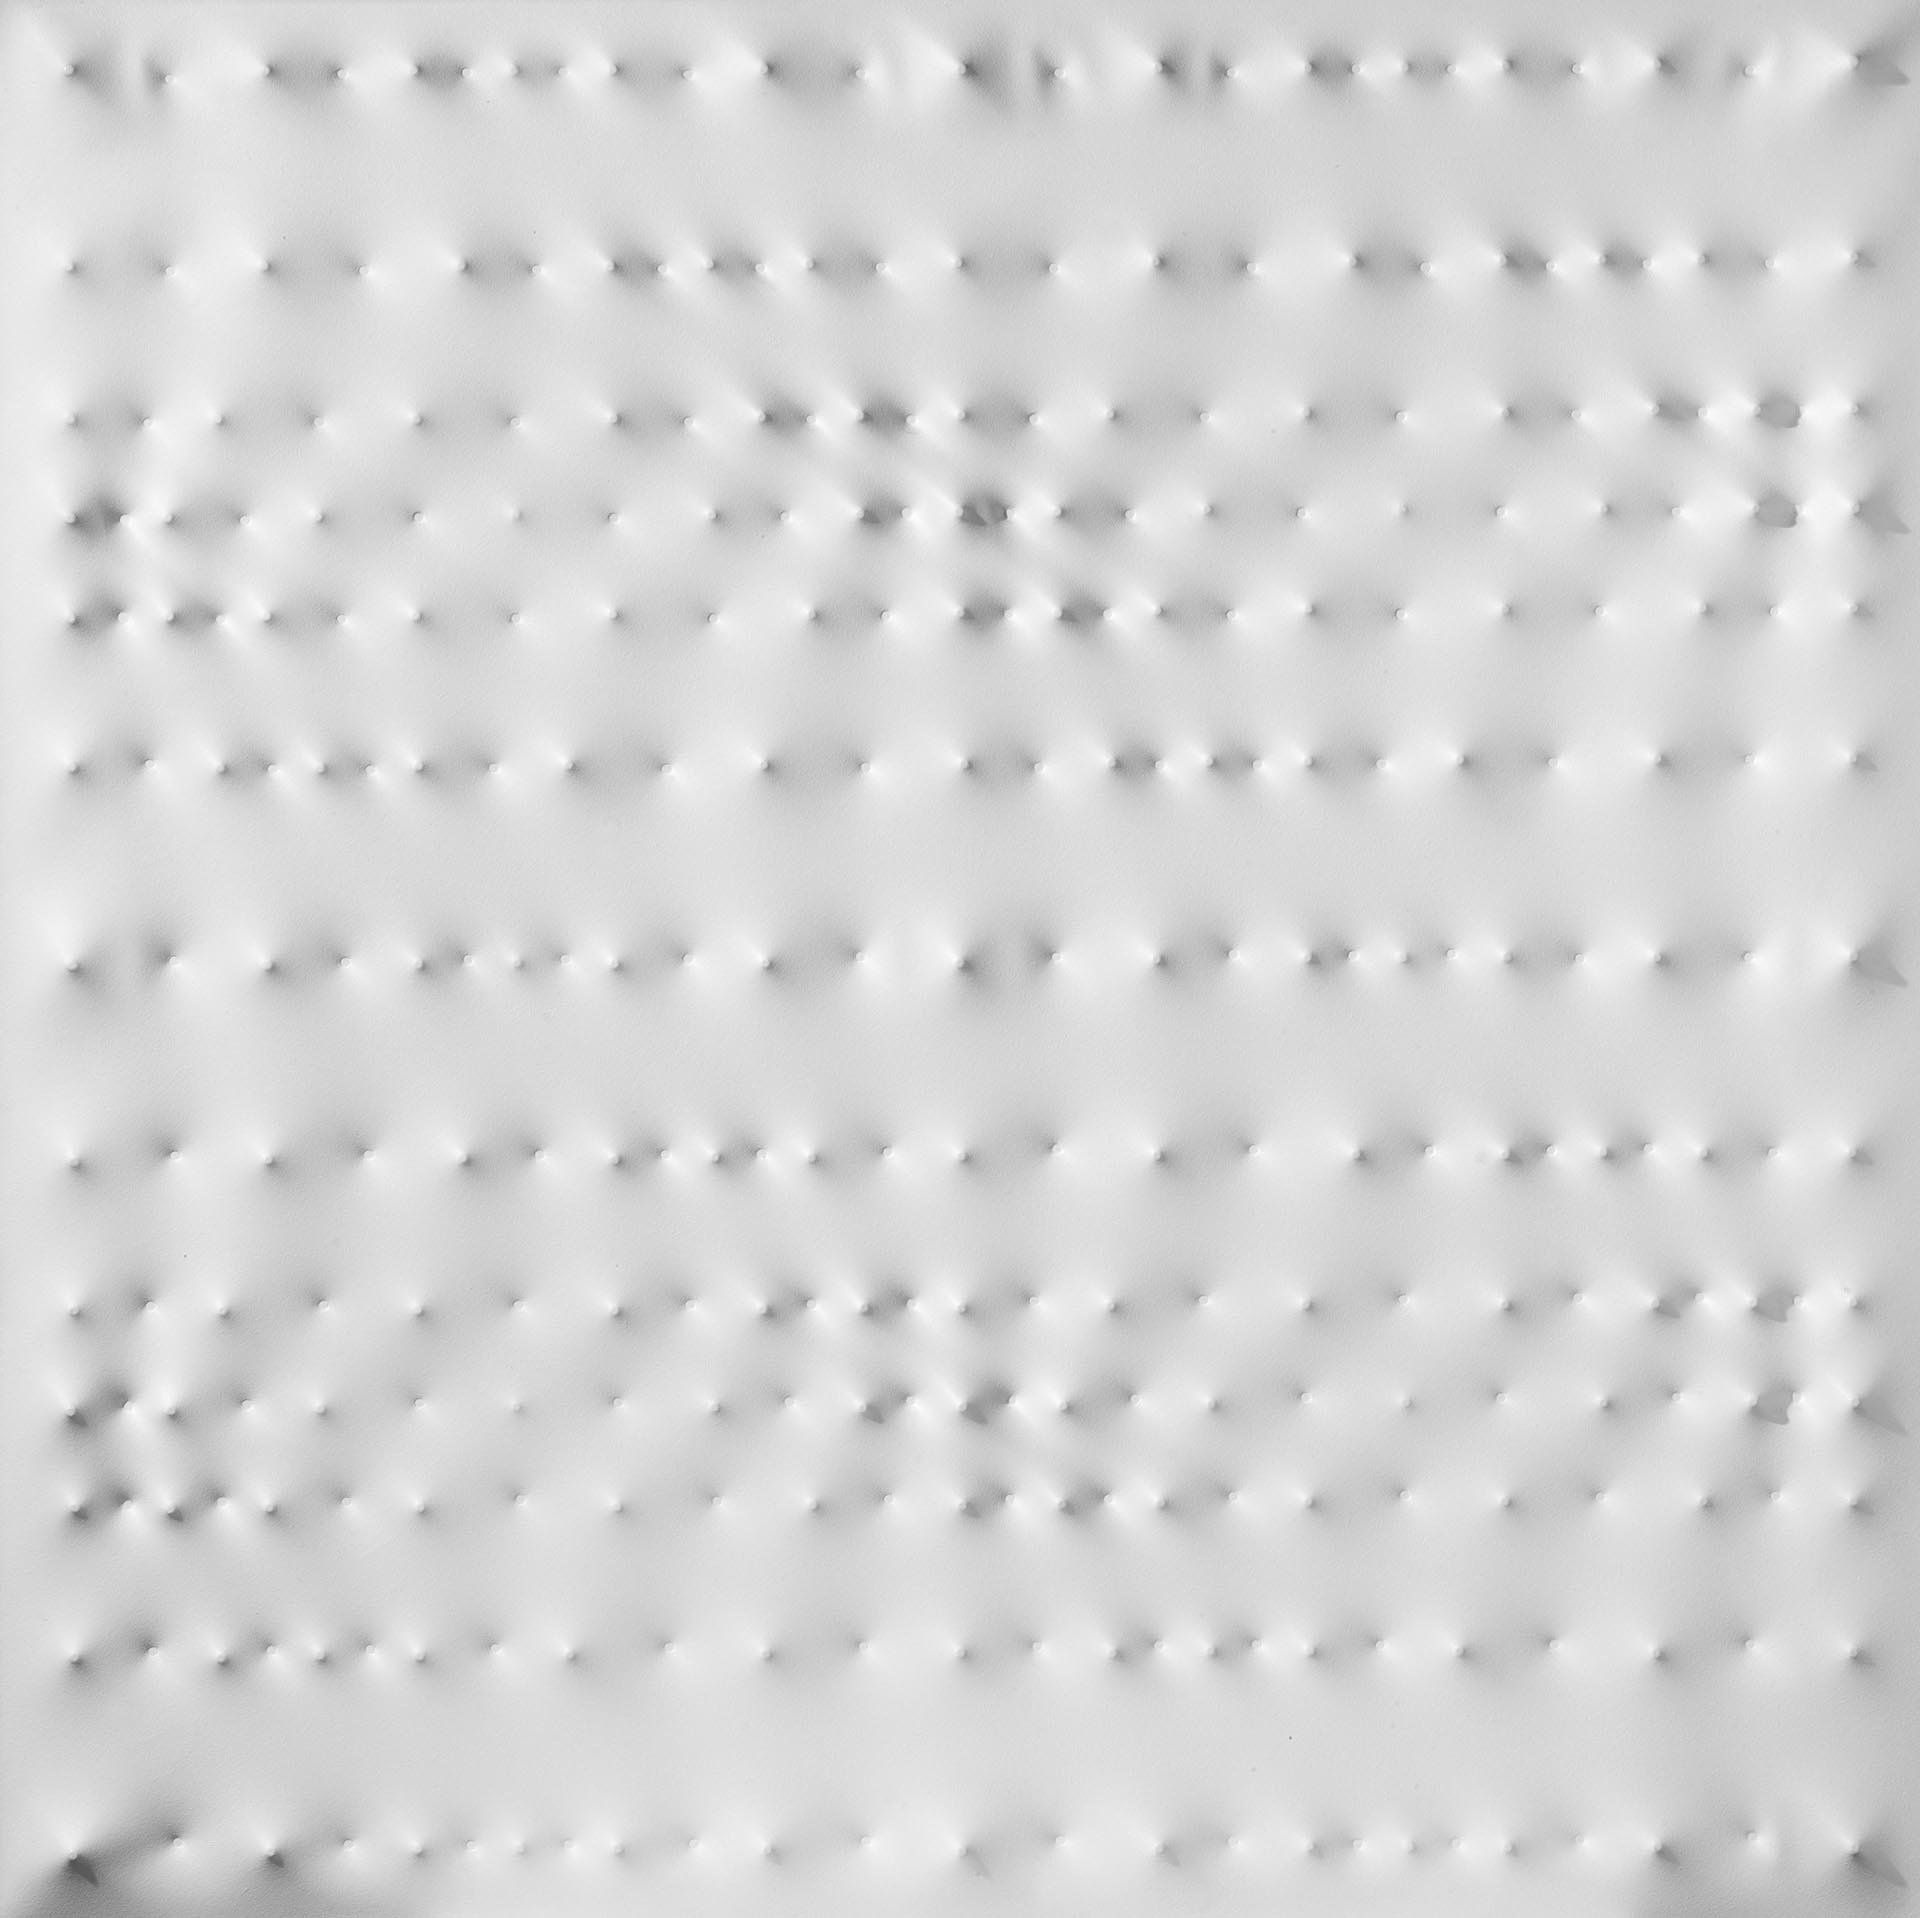 Castellani, Superficie bianca, 1990, 120x120 cm